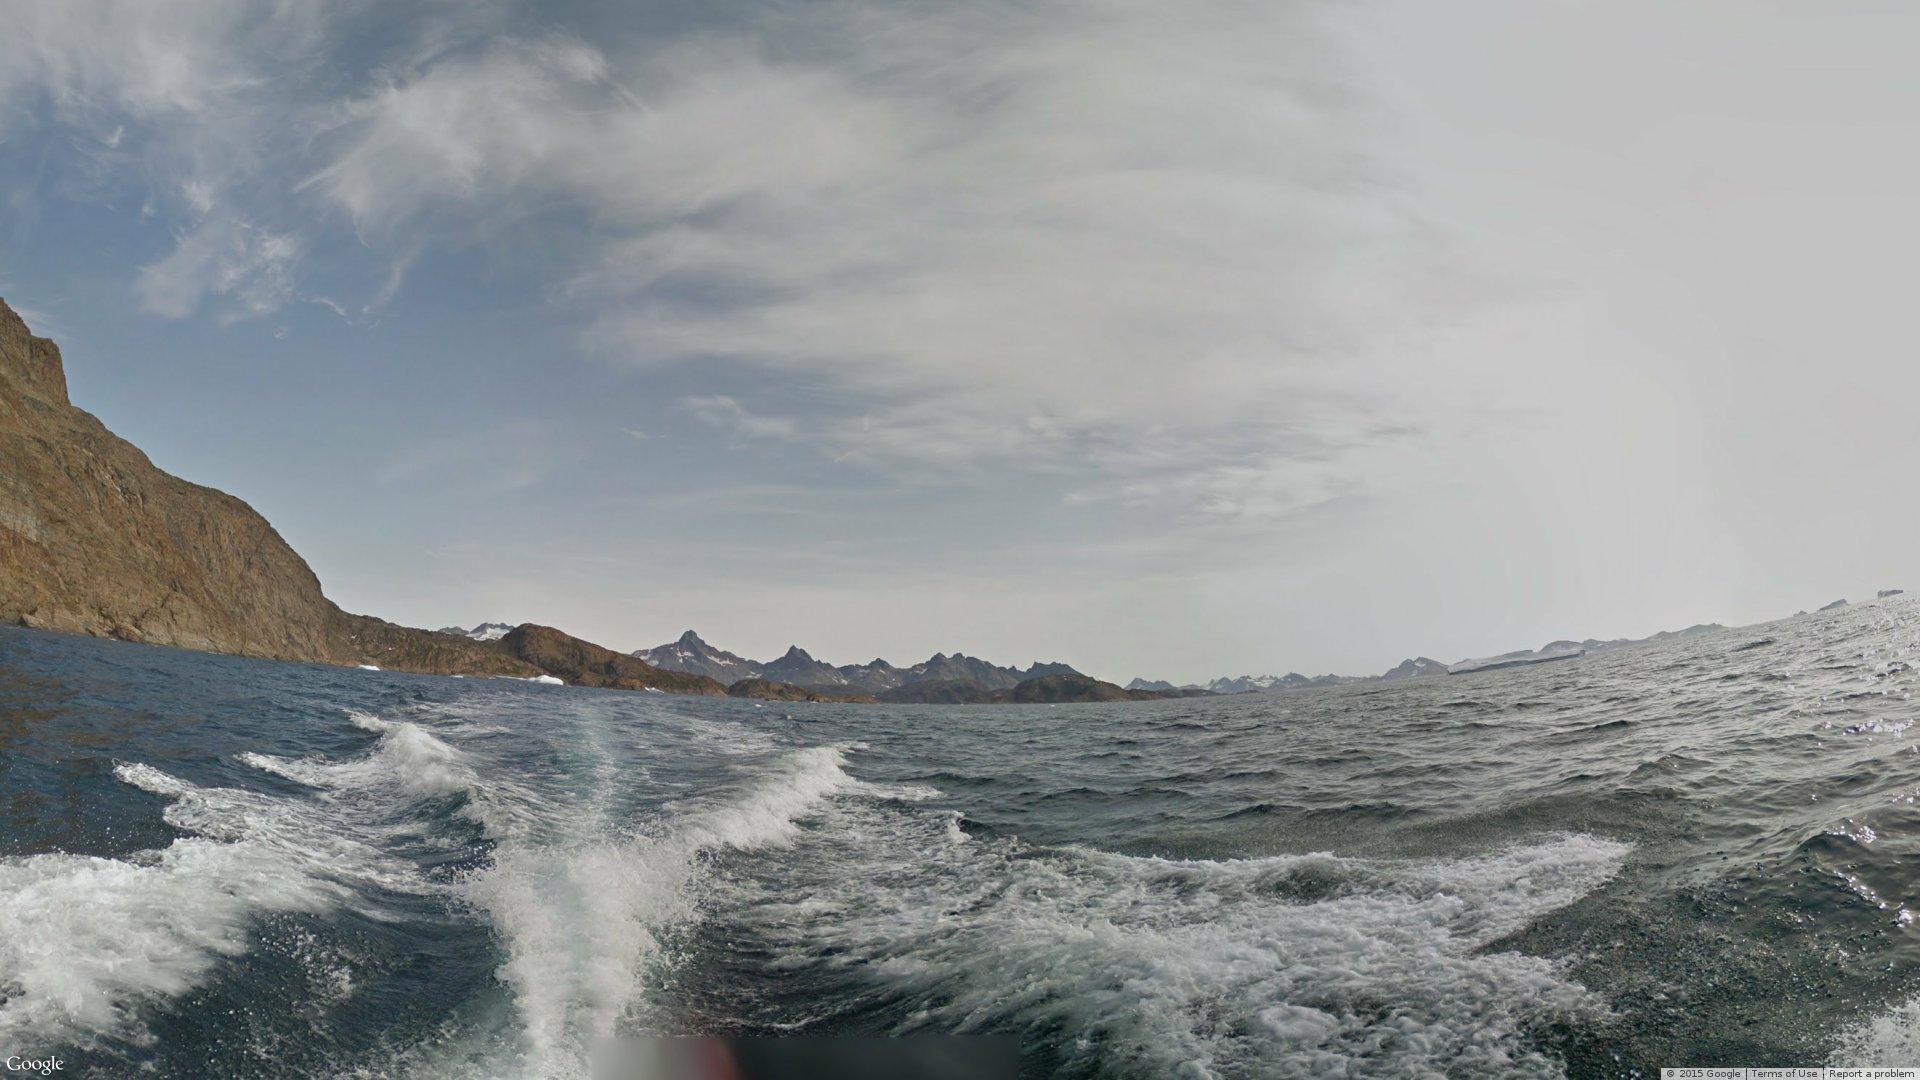 Iliveqarpimmut, Greenland